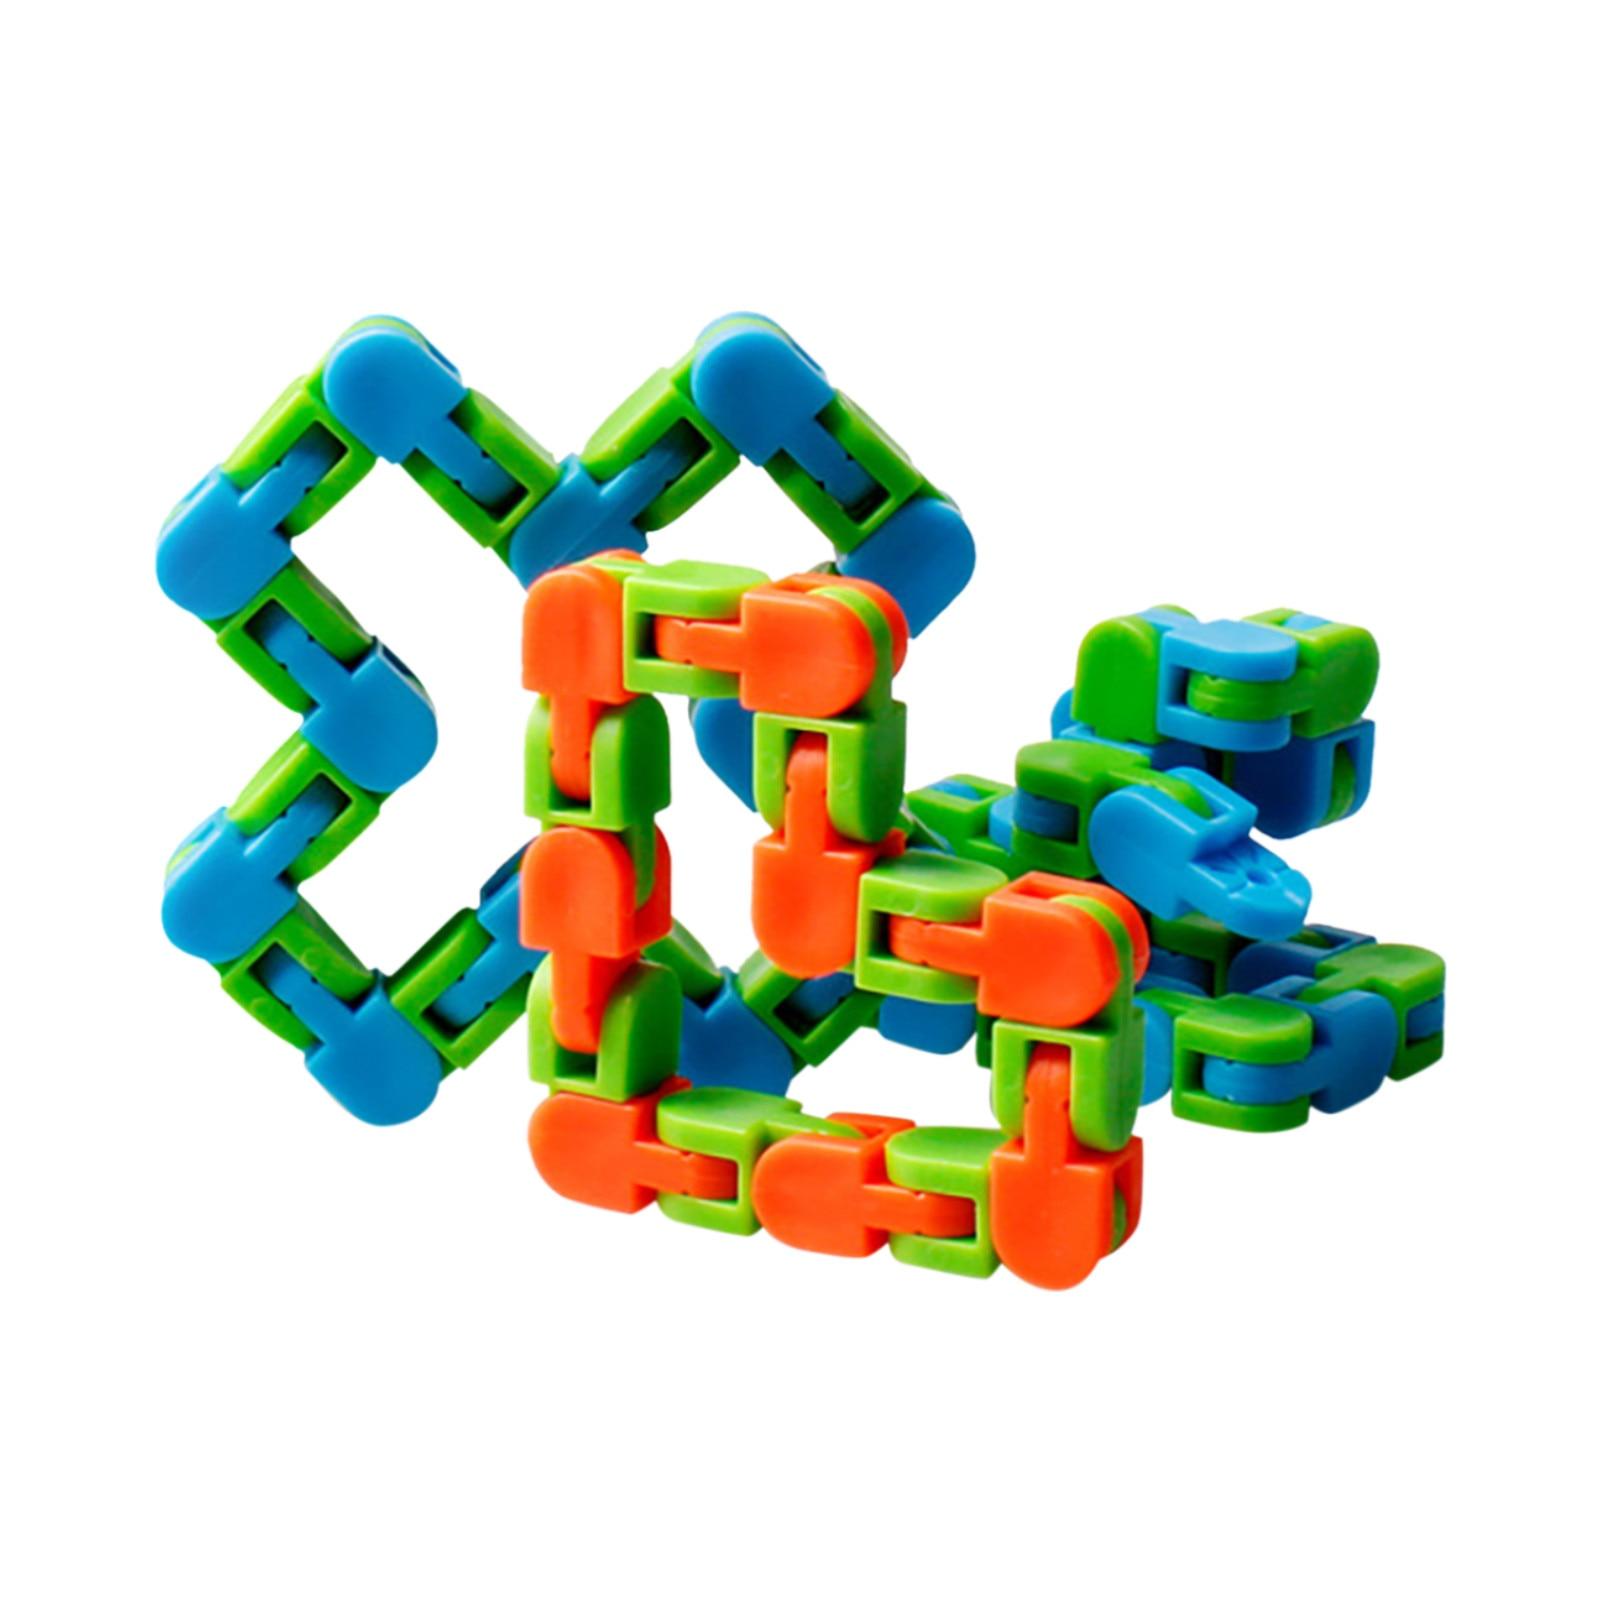 Sensory Toy Puzzles Decompression-Toys Fidget Autism Wacky Tracks Click Snake And 24-Links img5